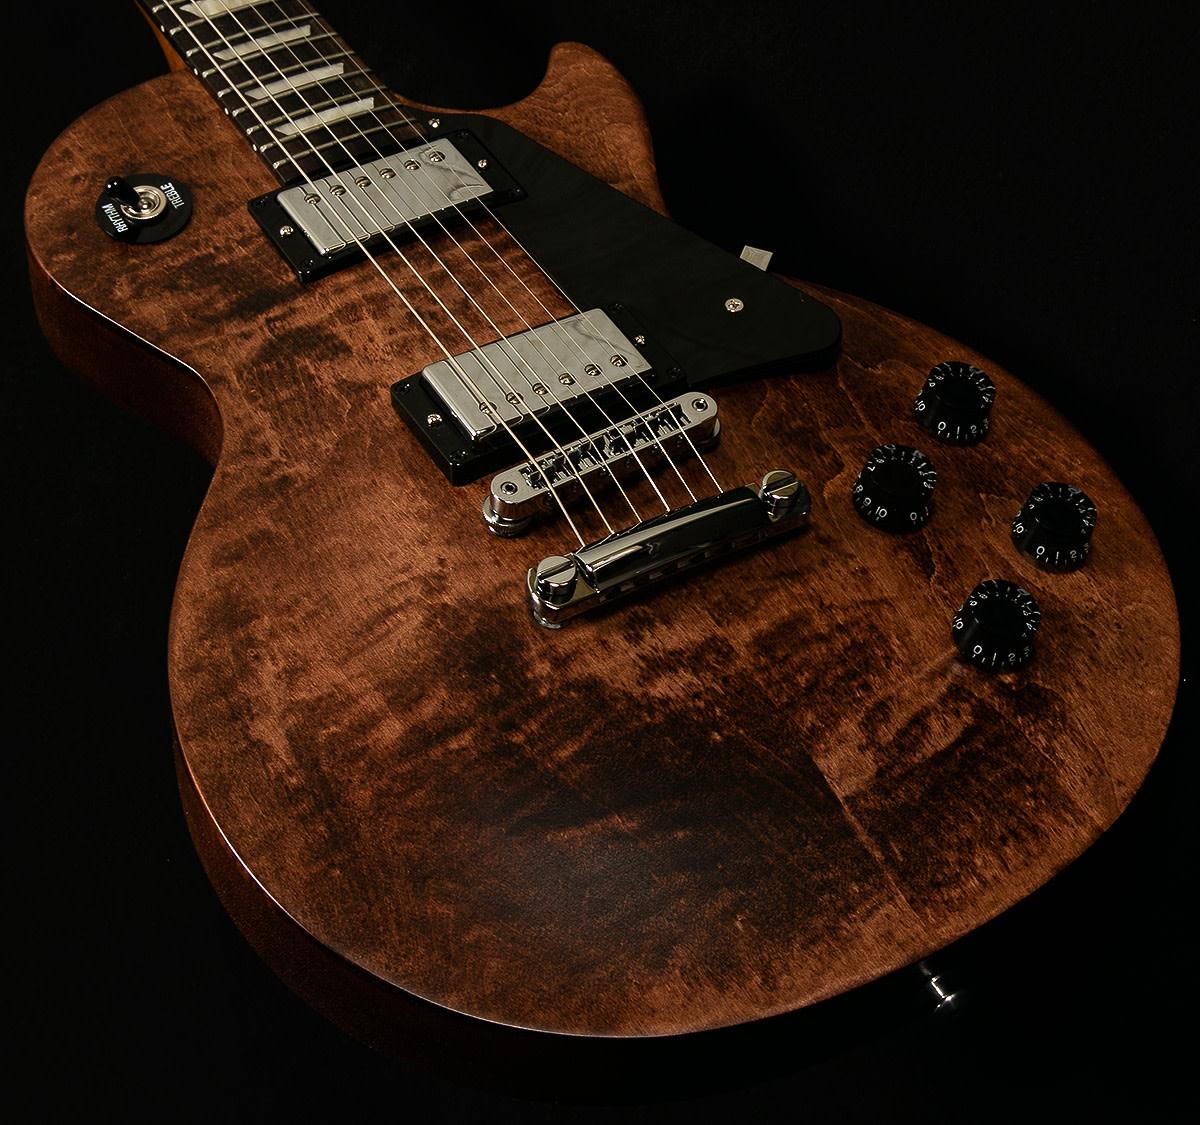 5 Best Gibson Les Paul Guitars under a Thousand Dollars 2015-2017